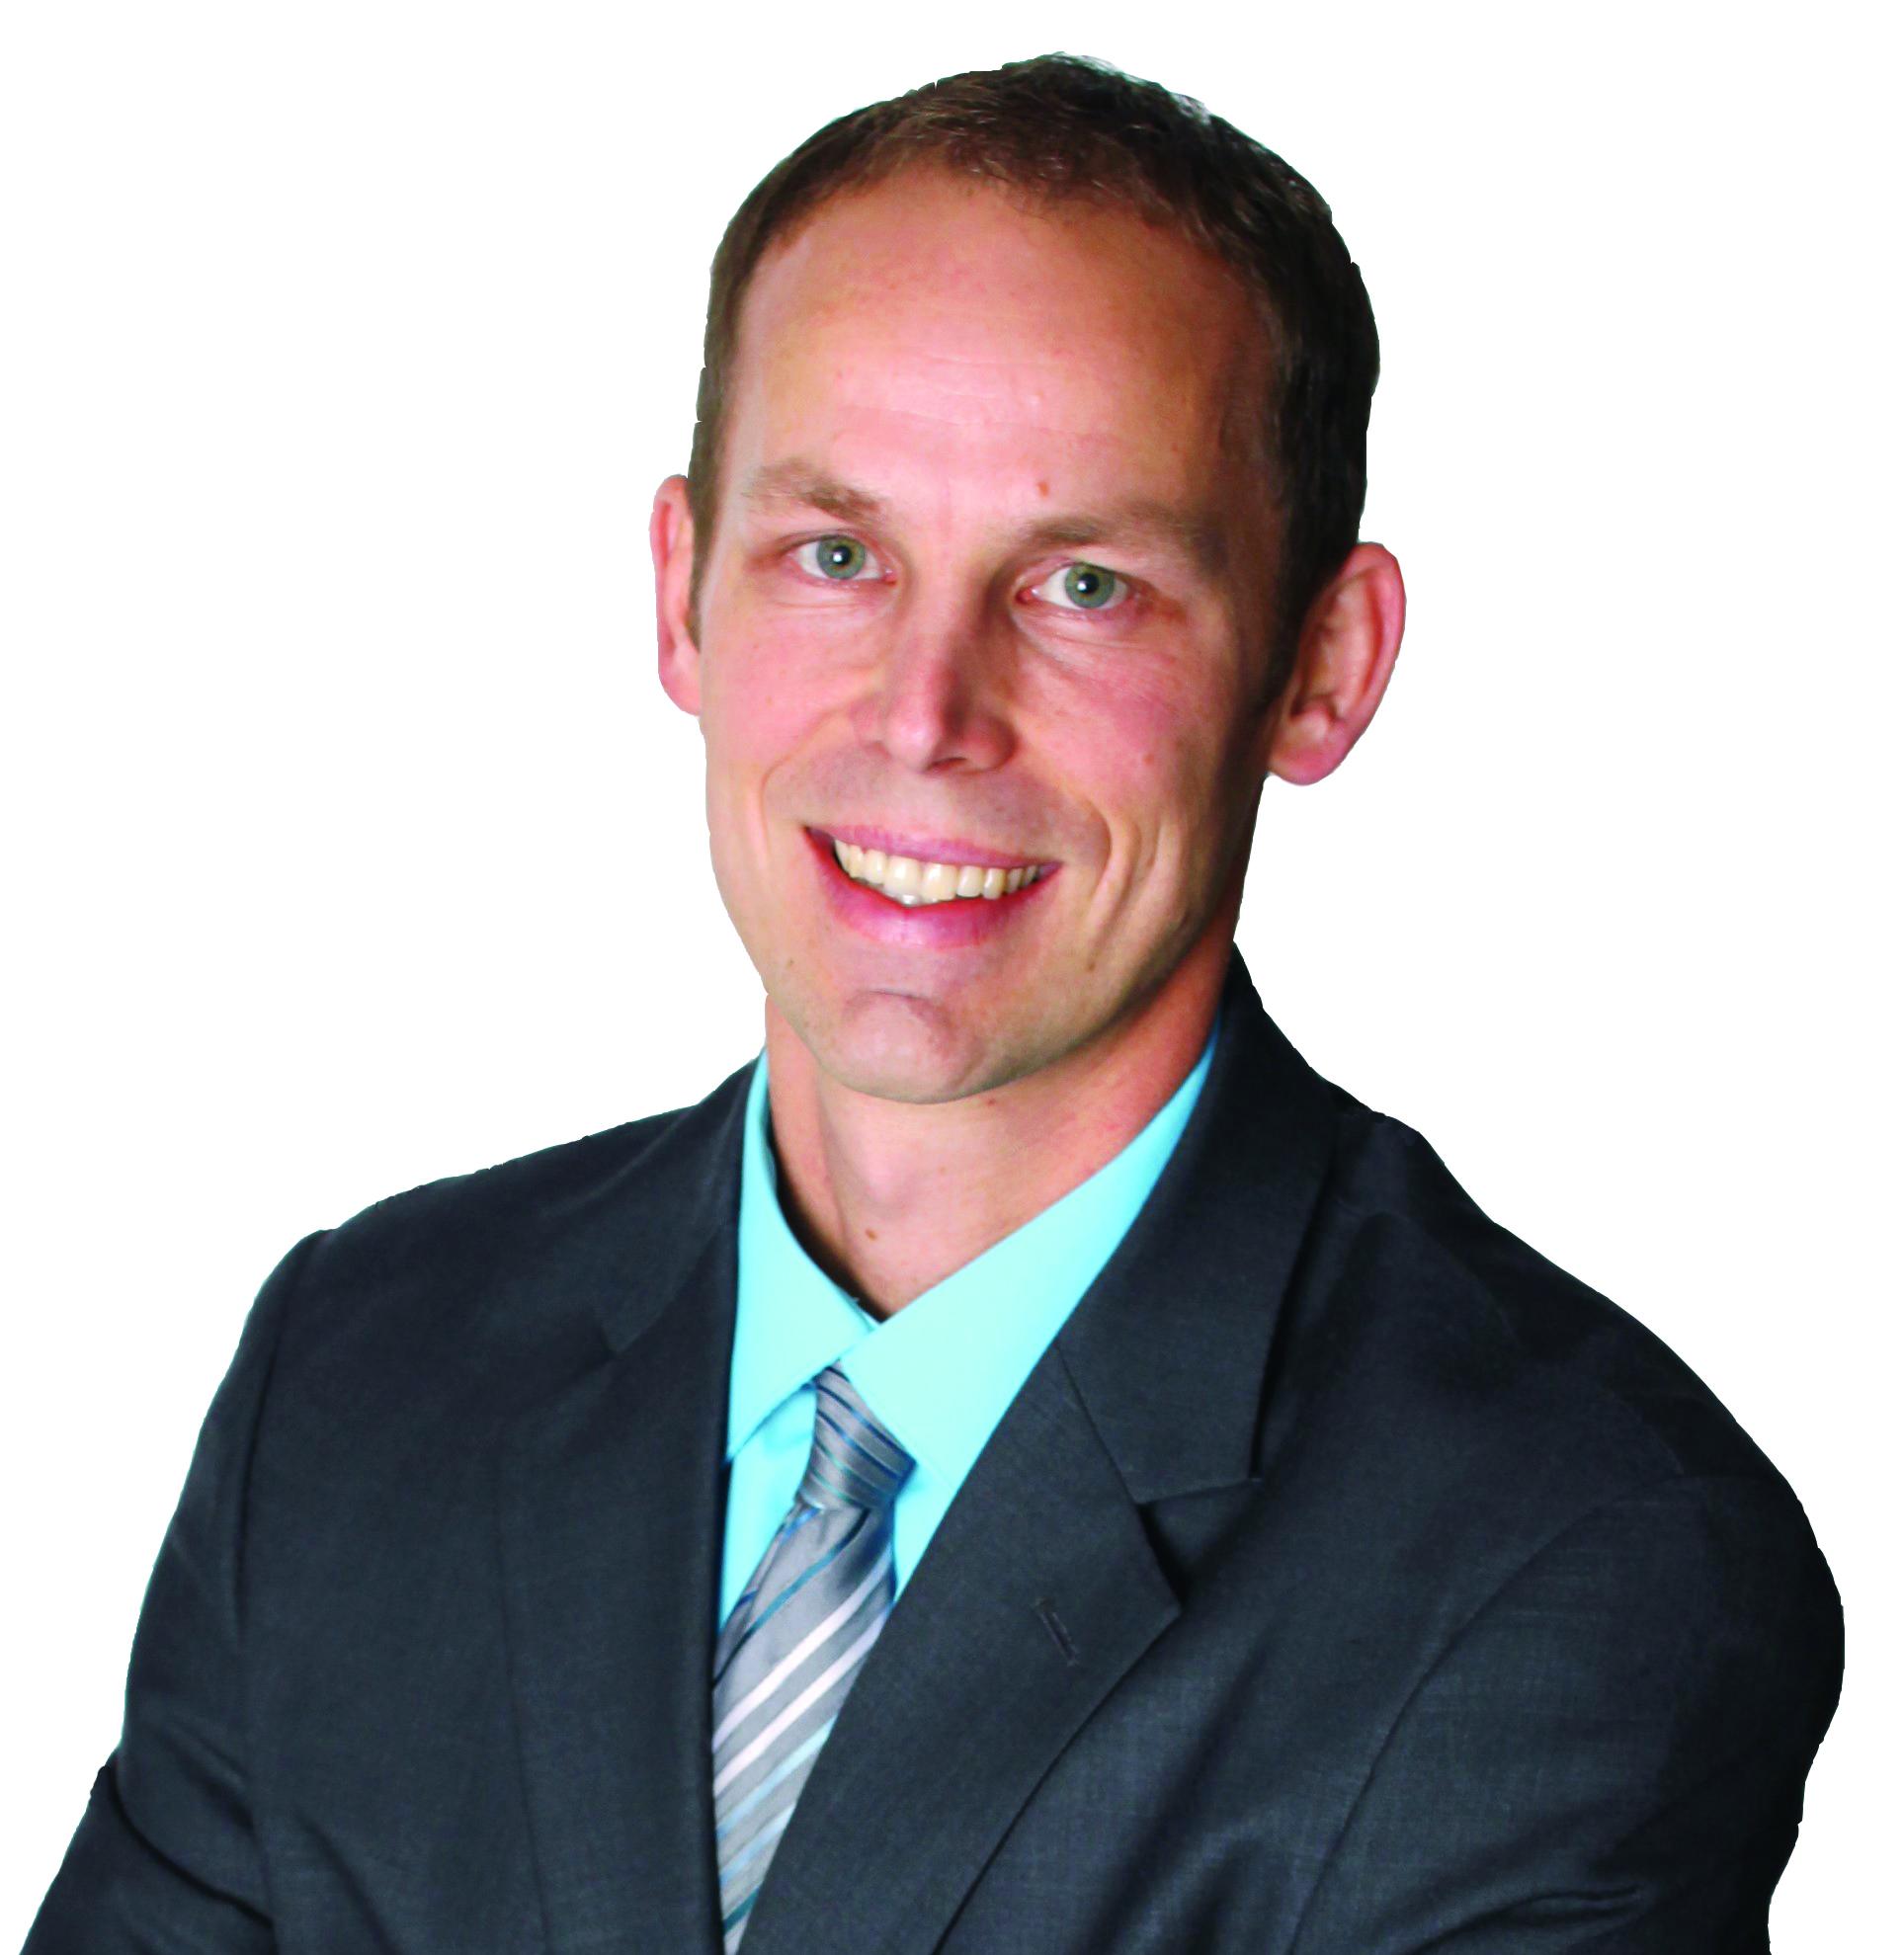 Paul Hoogendoorn, financial advisor Sioux Center IA